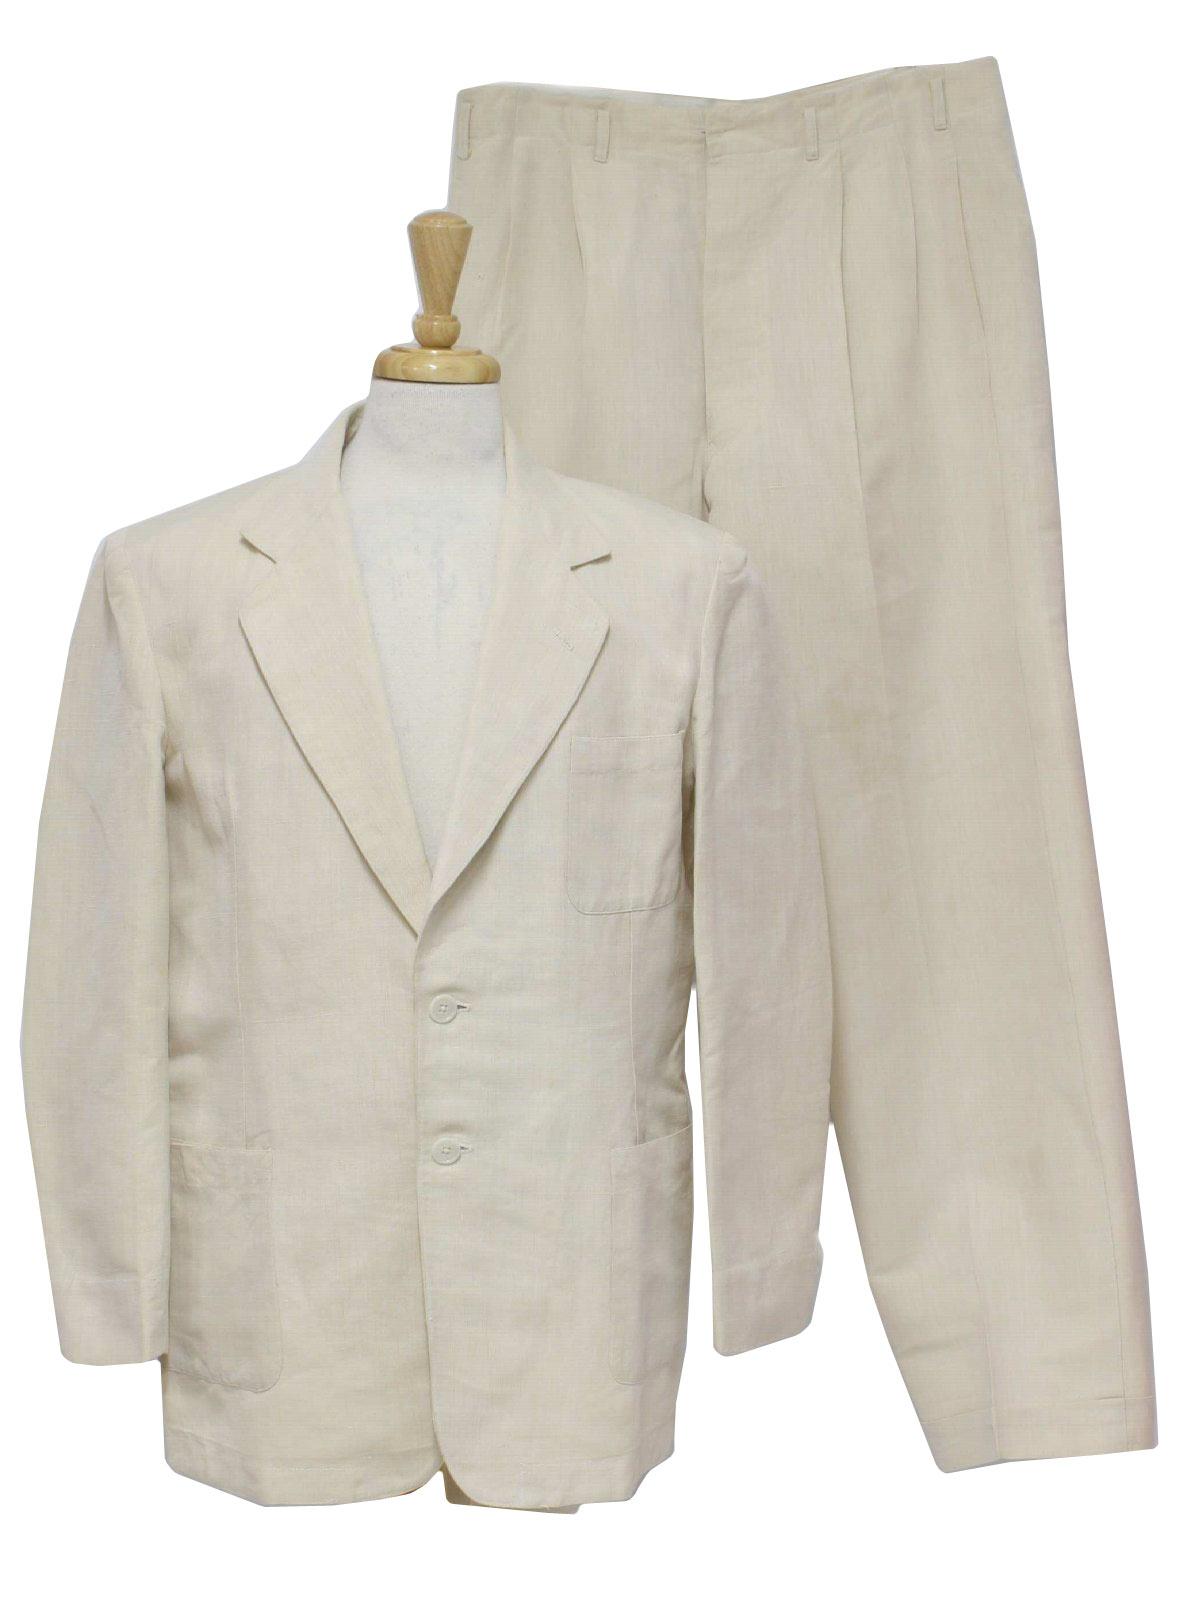 1930s Vintage Suit Late 30s No Label Mens Two Piece Tropical With Cream Linen Weave Palm Beach Cloth Jacket Wide Notched Lapels